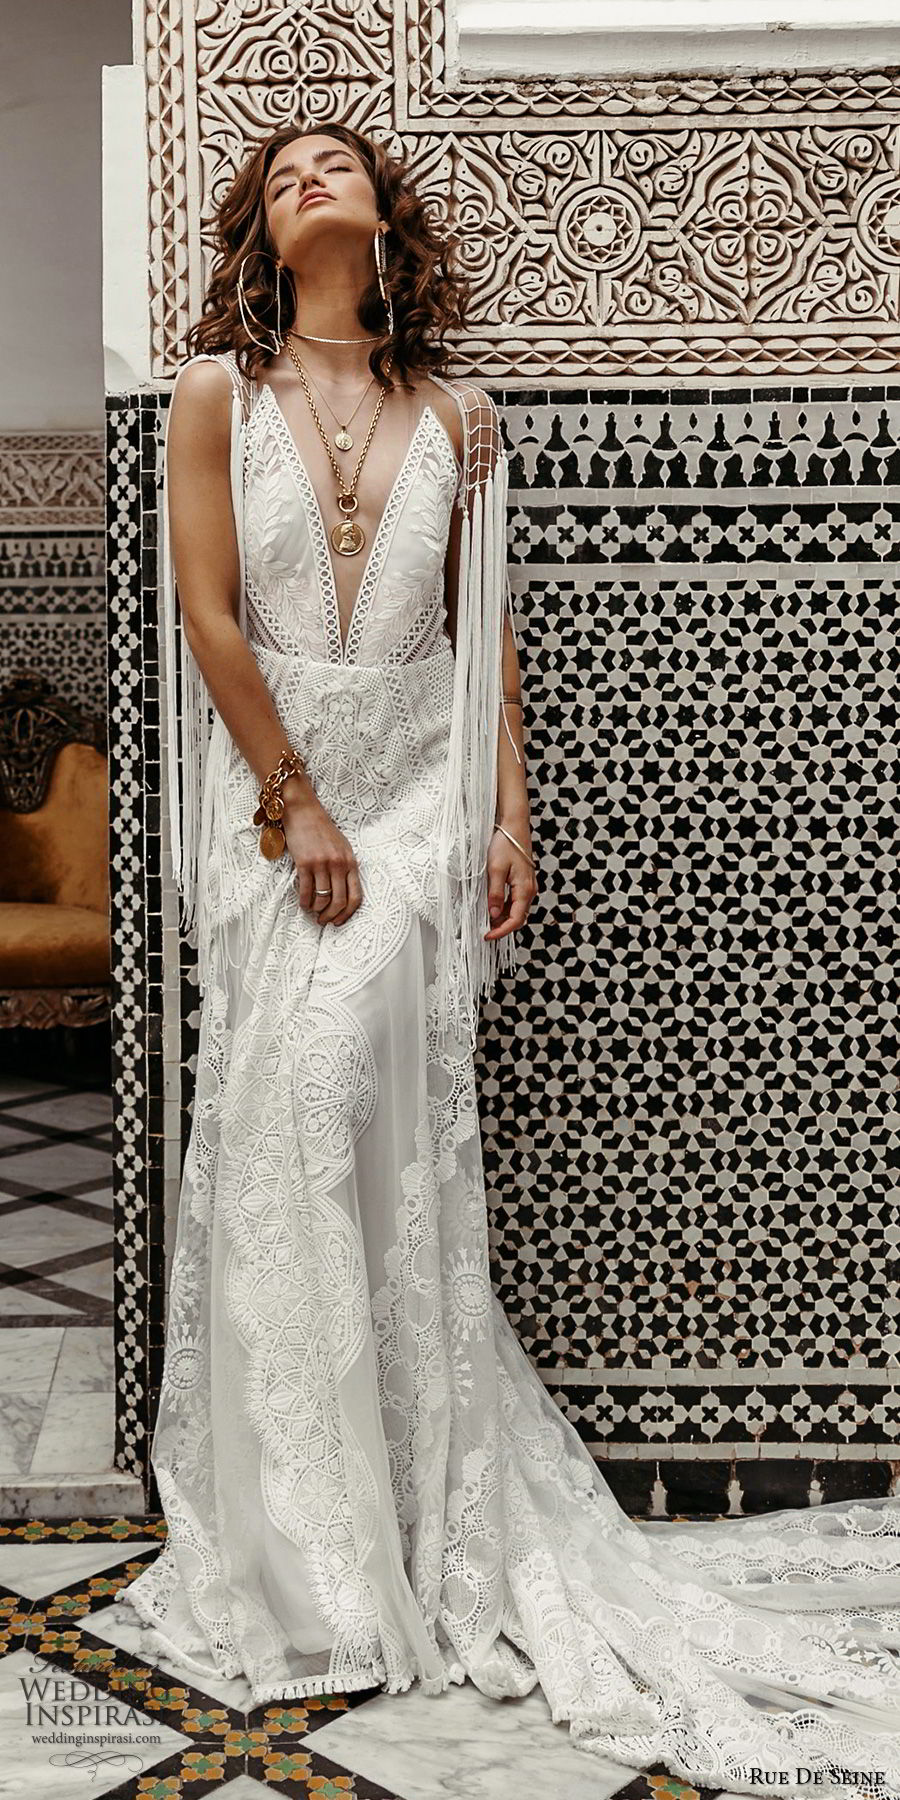 rue de seine 2019 bridal sleeveless illusion straps plunging v neckline embellished lace modified a line wedding dress (12) boho chic romantic open back chapel train mv